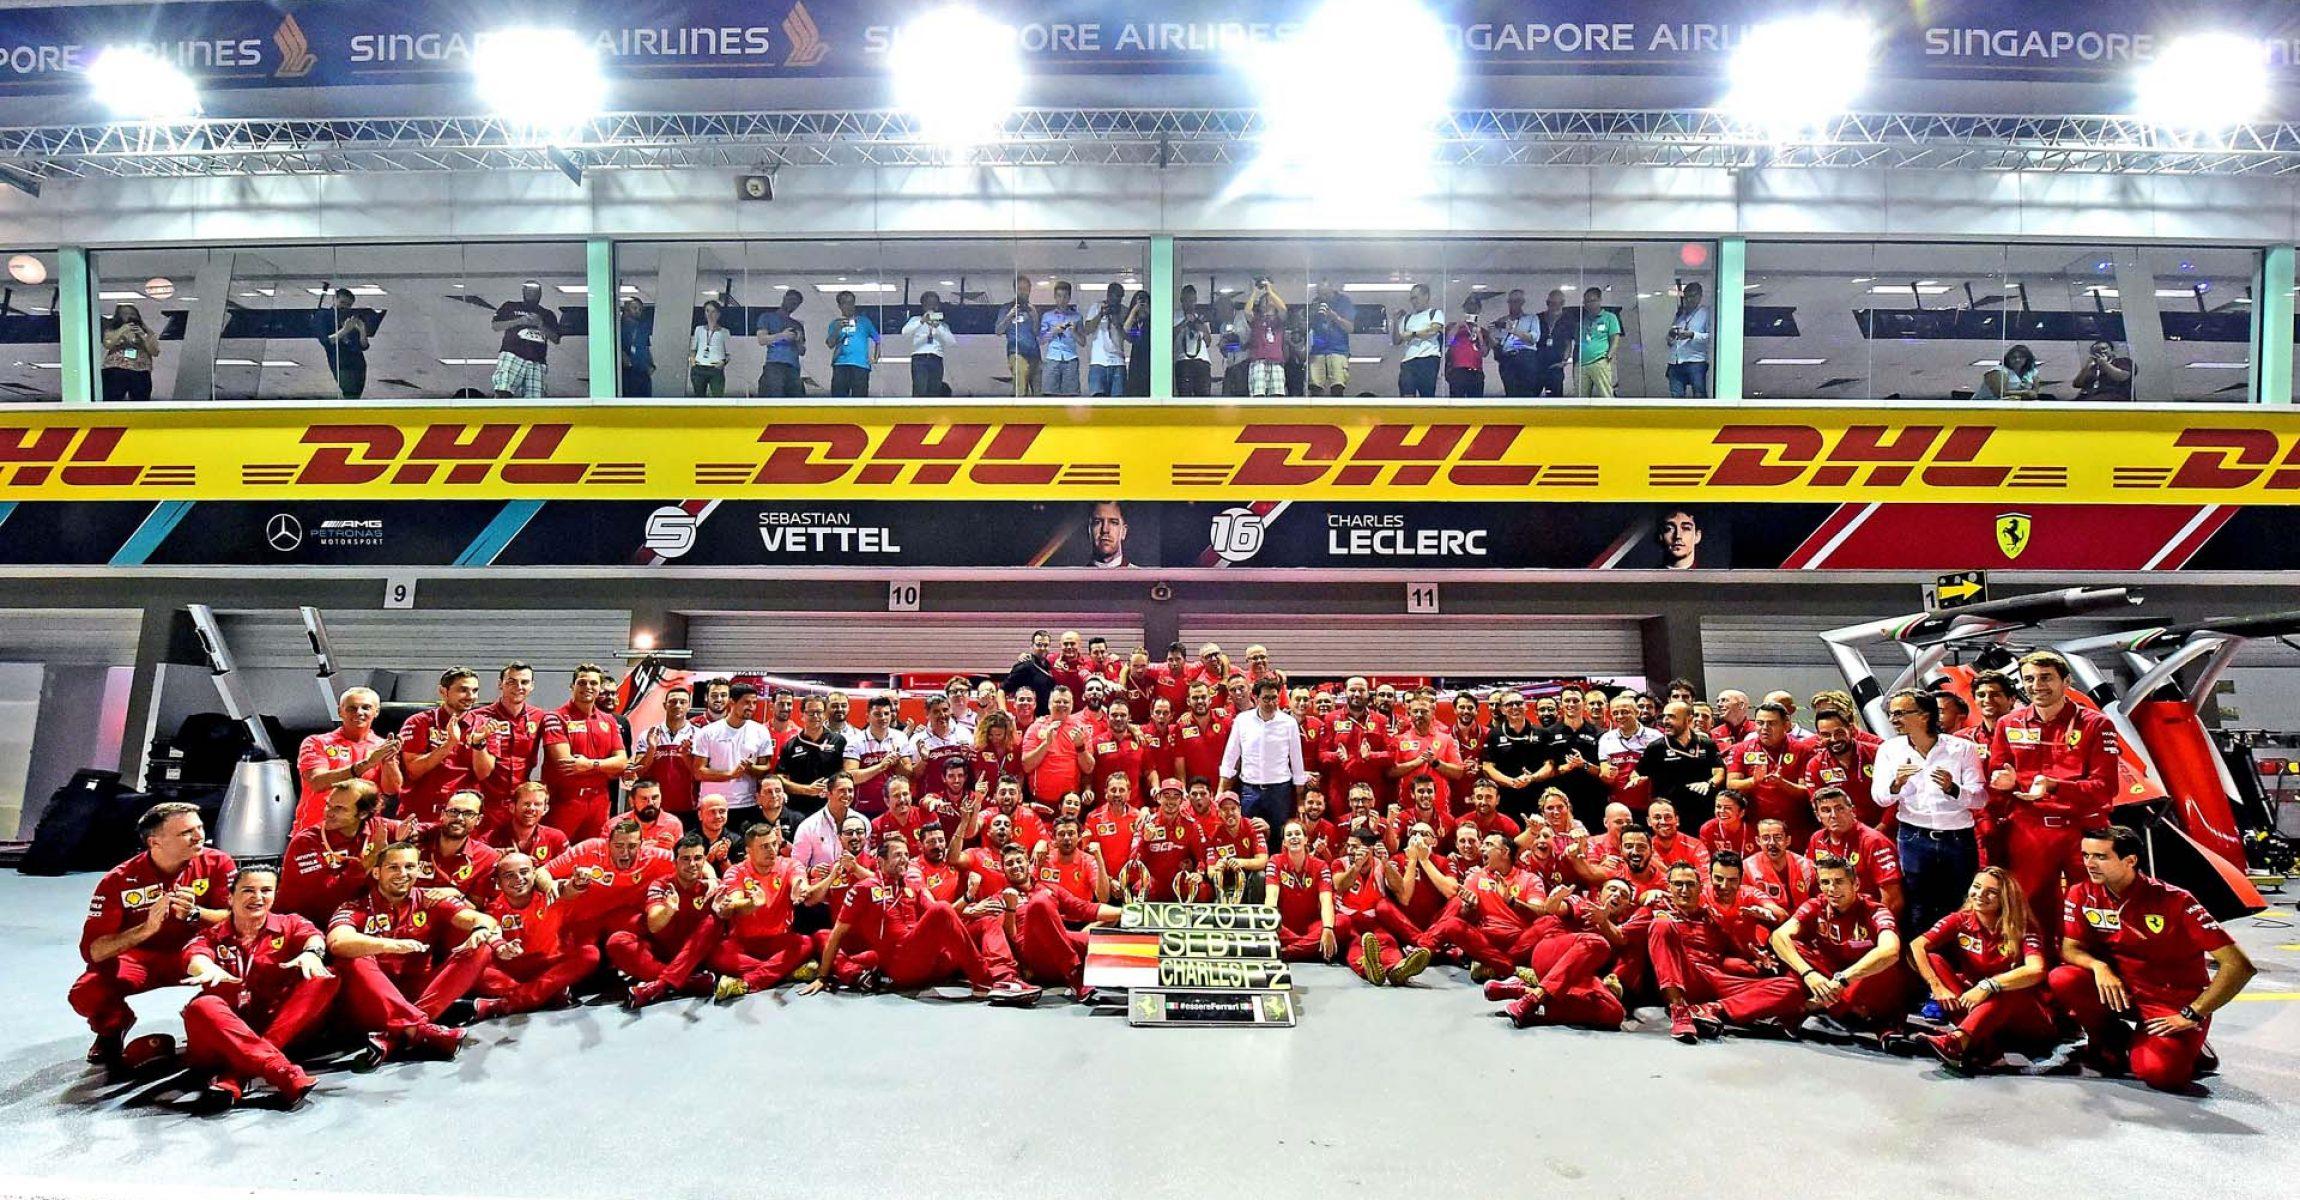 GP SINGAPORE F1/2019 -  DOMENICA 22/09/2019   credit: @Scuderia Ferrari Press Office Ferrari team photo after Singapore, Sebastian Vettel, Charles Leclerc, Mattia Binotto